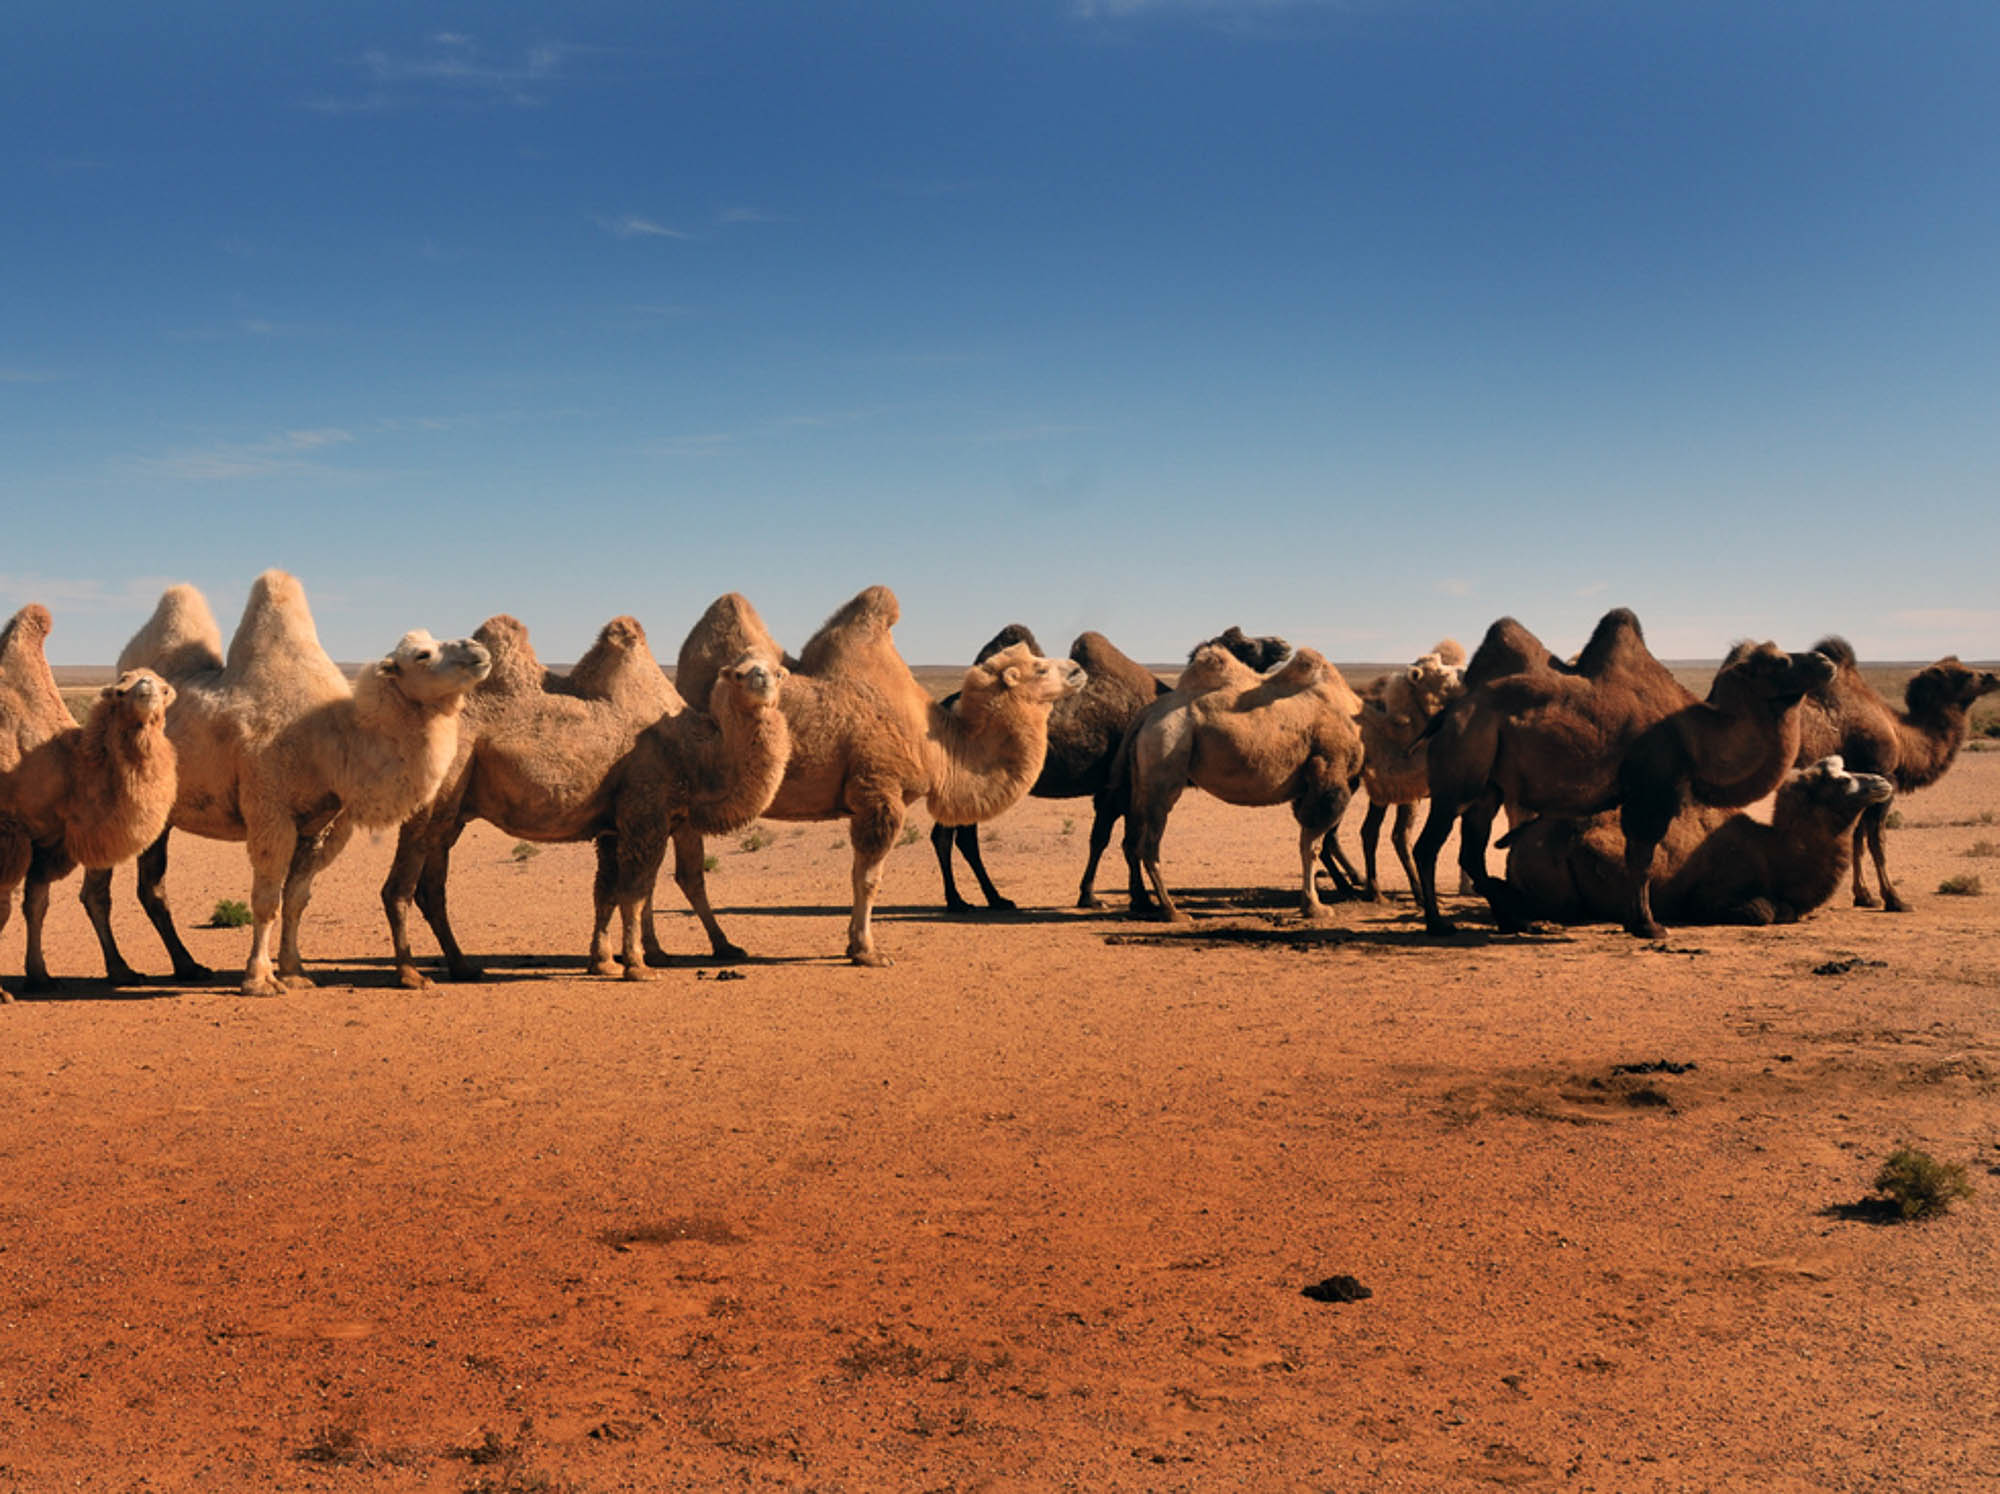 Mongolie chameaux.jpg